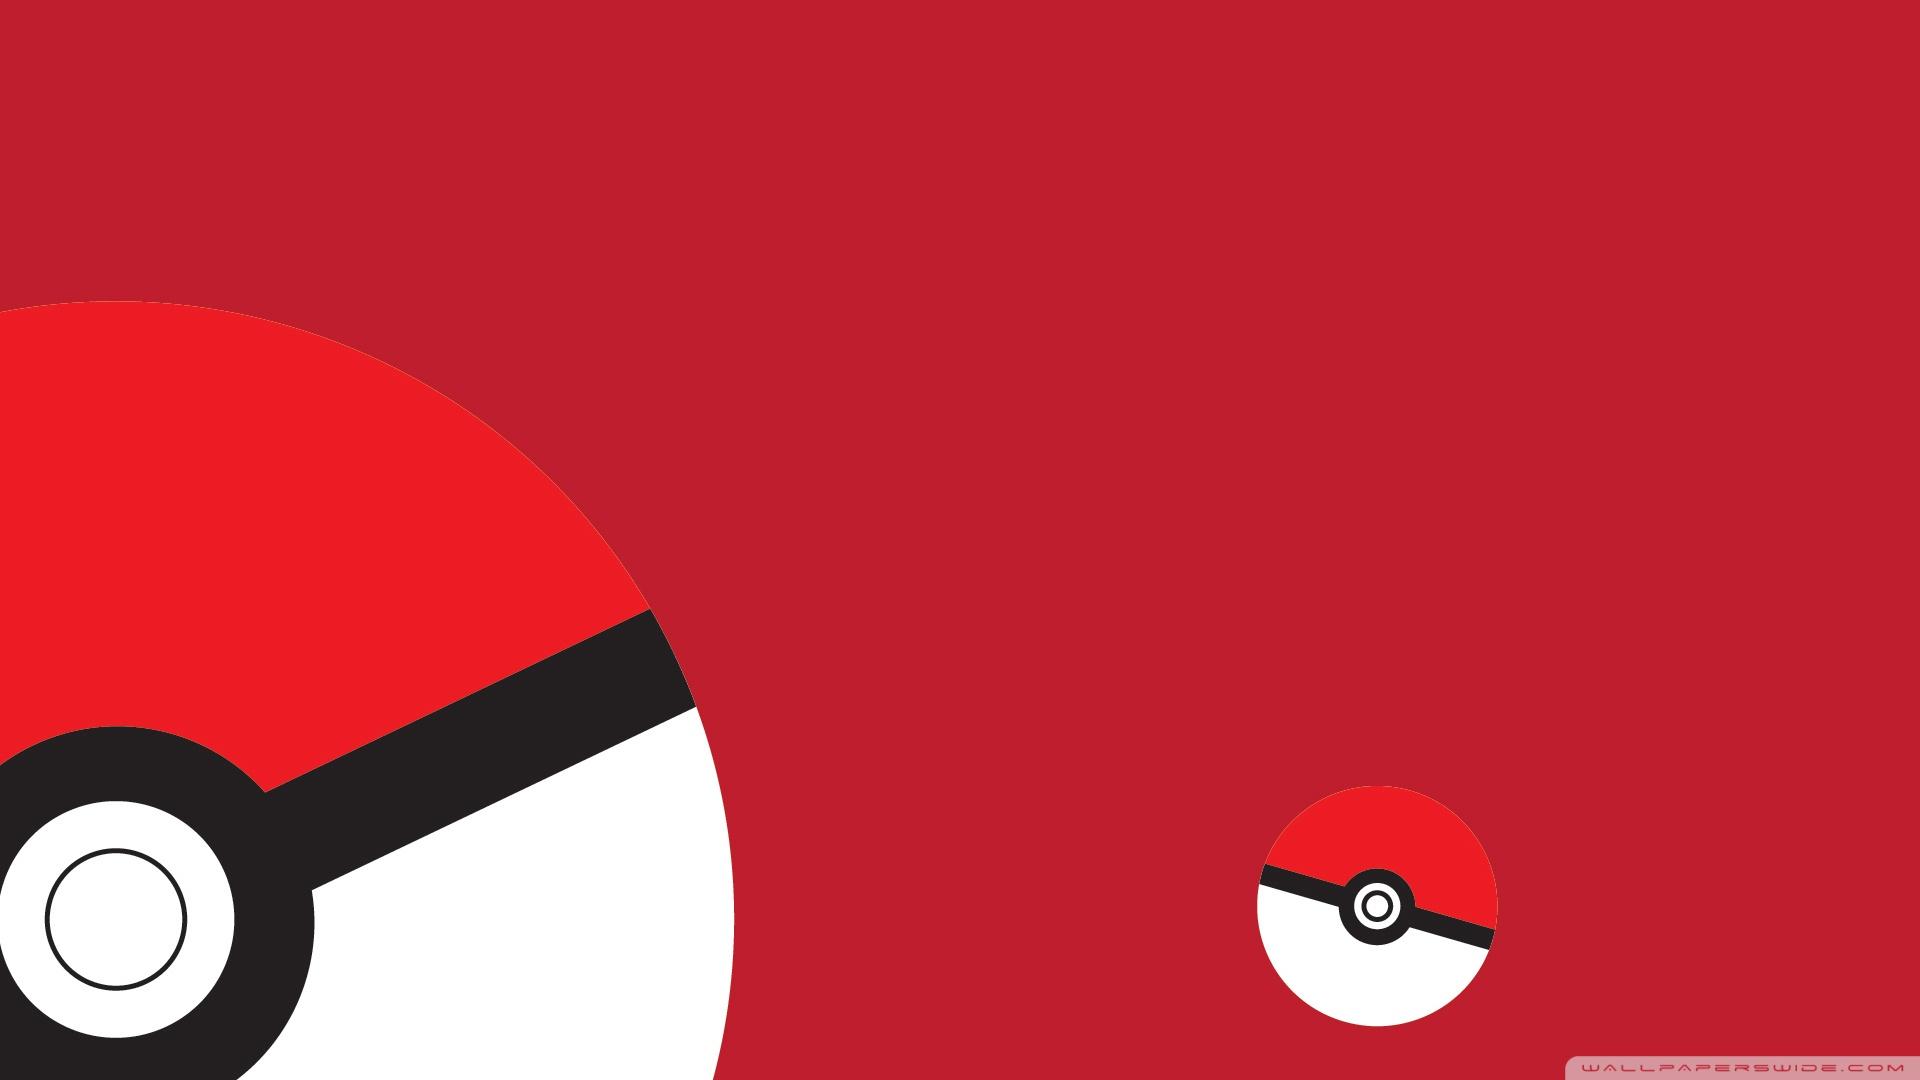 Pokemon Background Pokeball wallpapers HD   407821 1920x1080